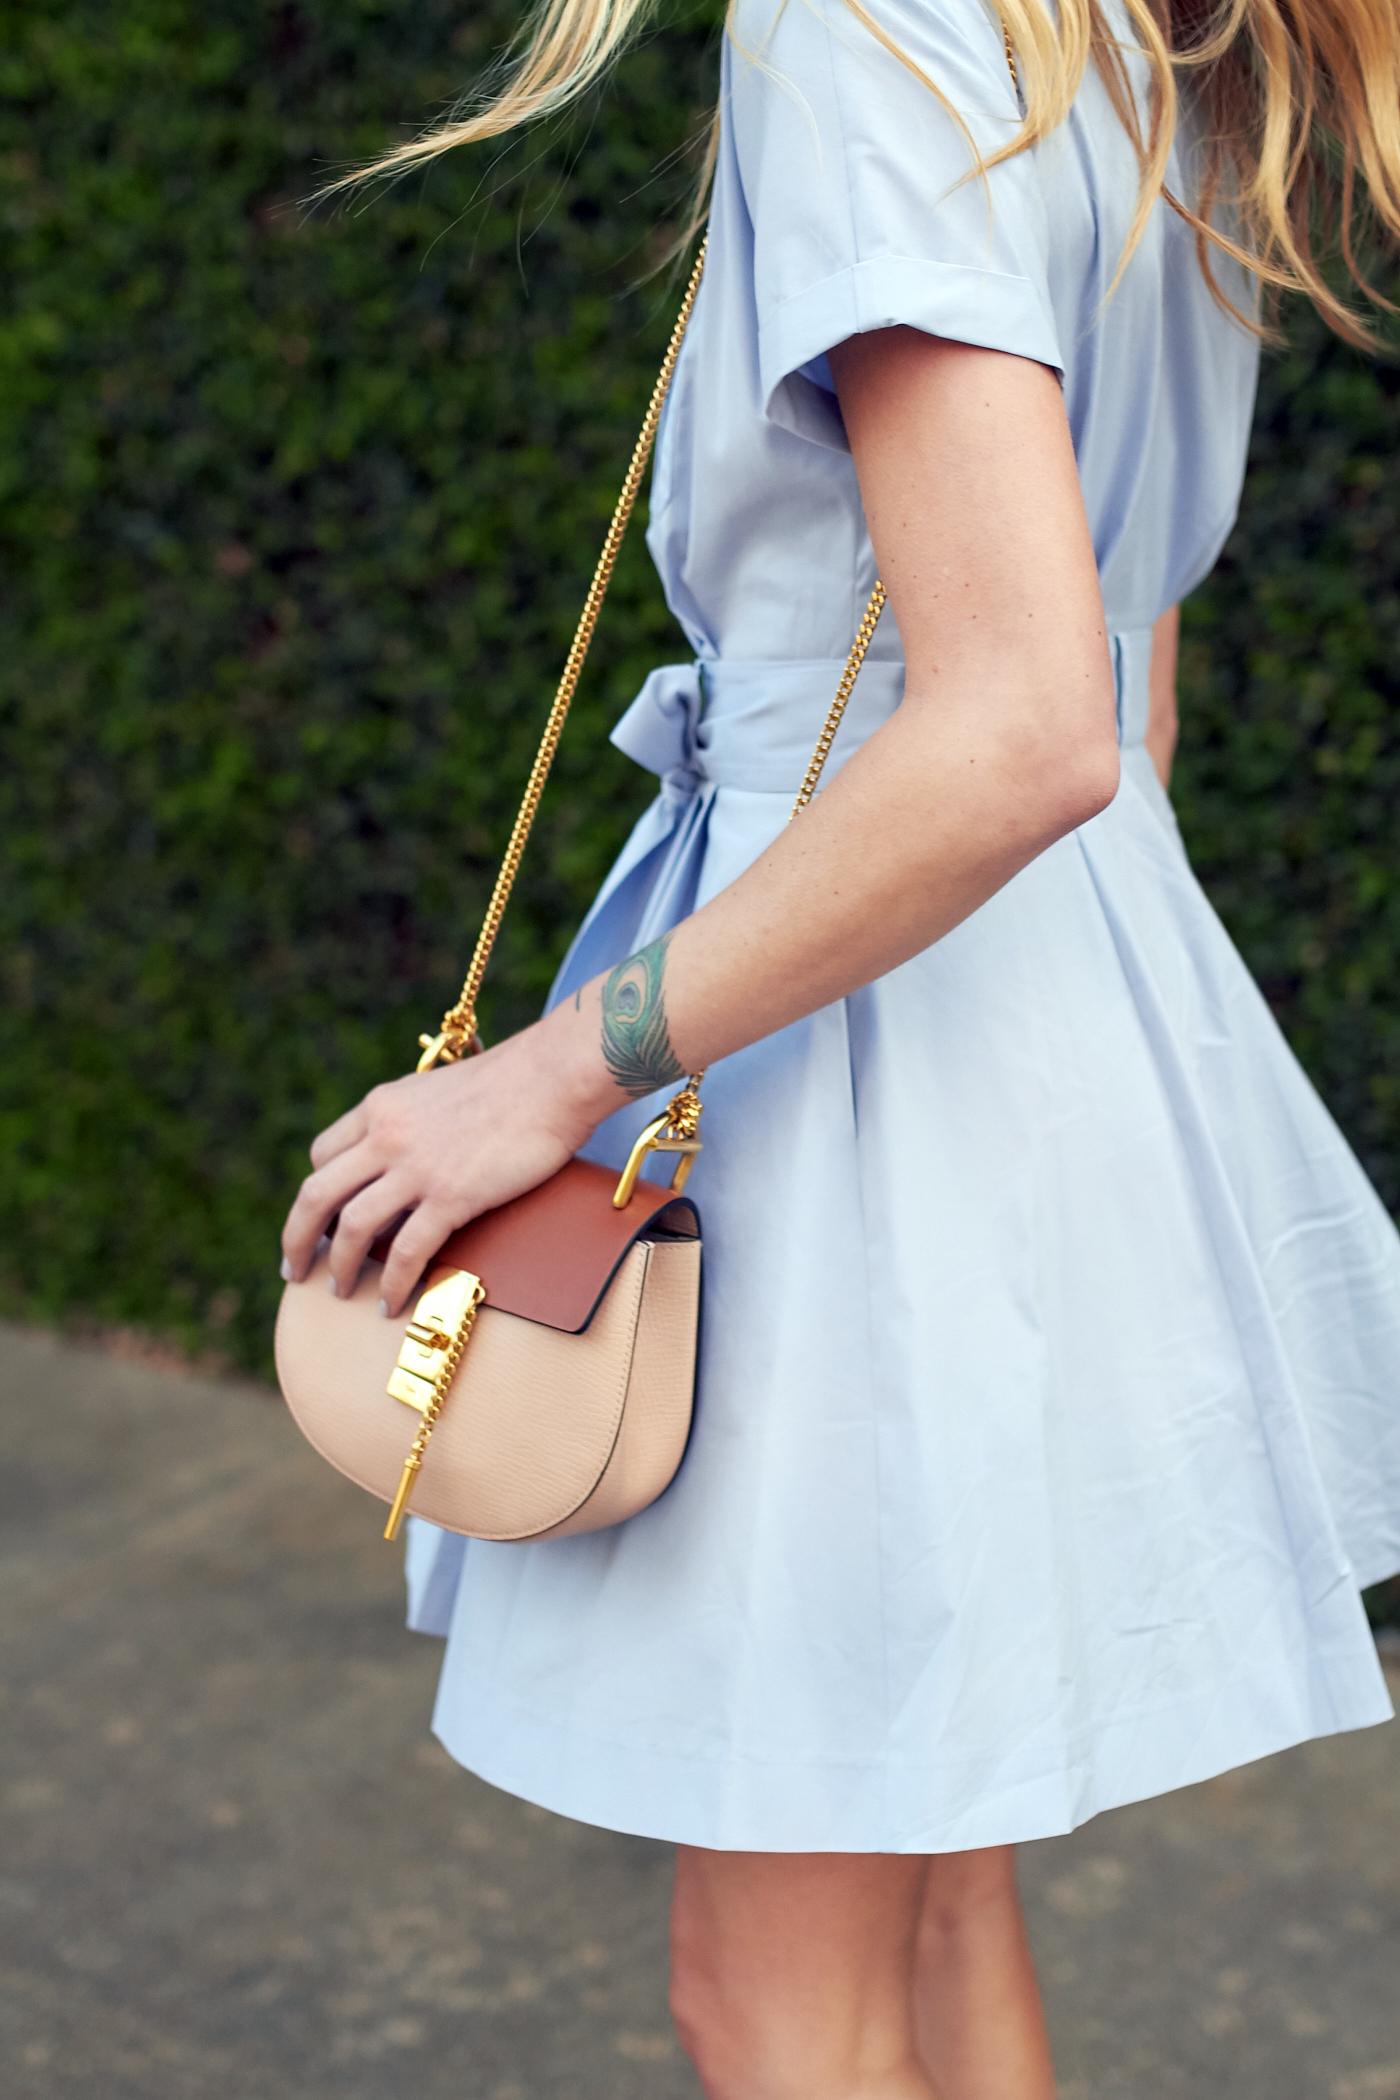 fashion-jackson-chloe-drew-handbag-cynthia-steffe-blue-shirtdress